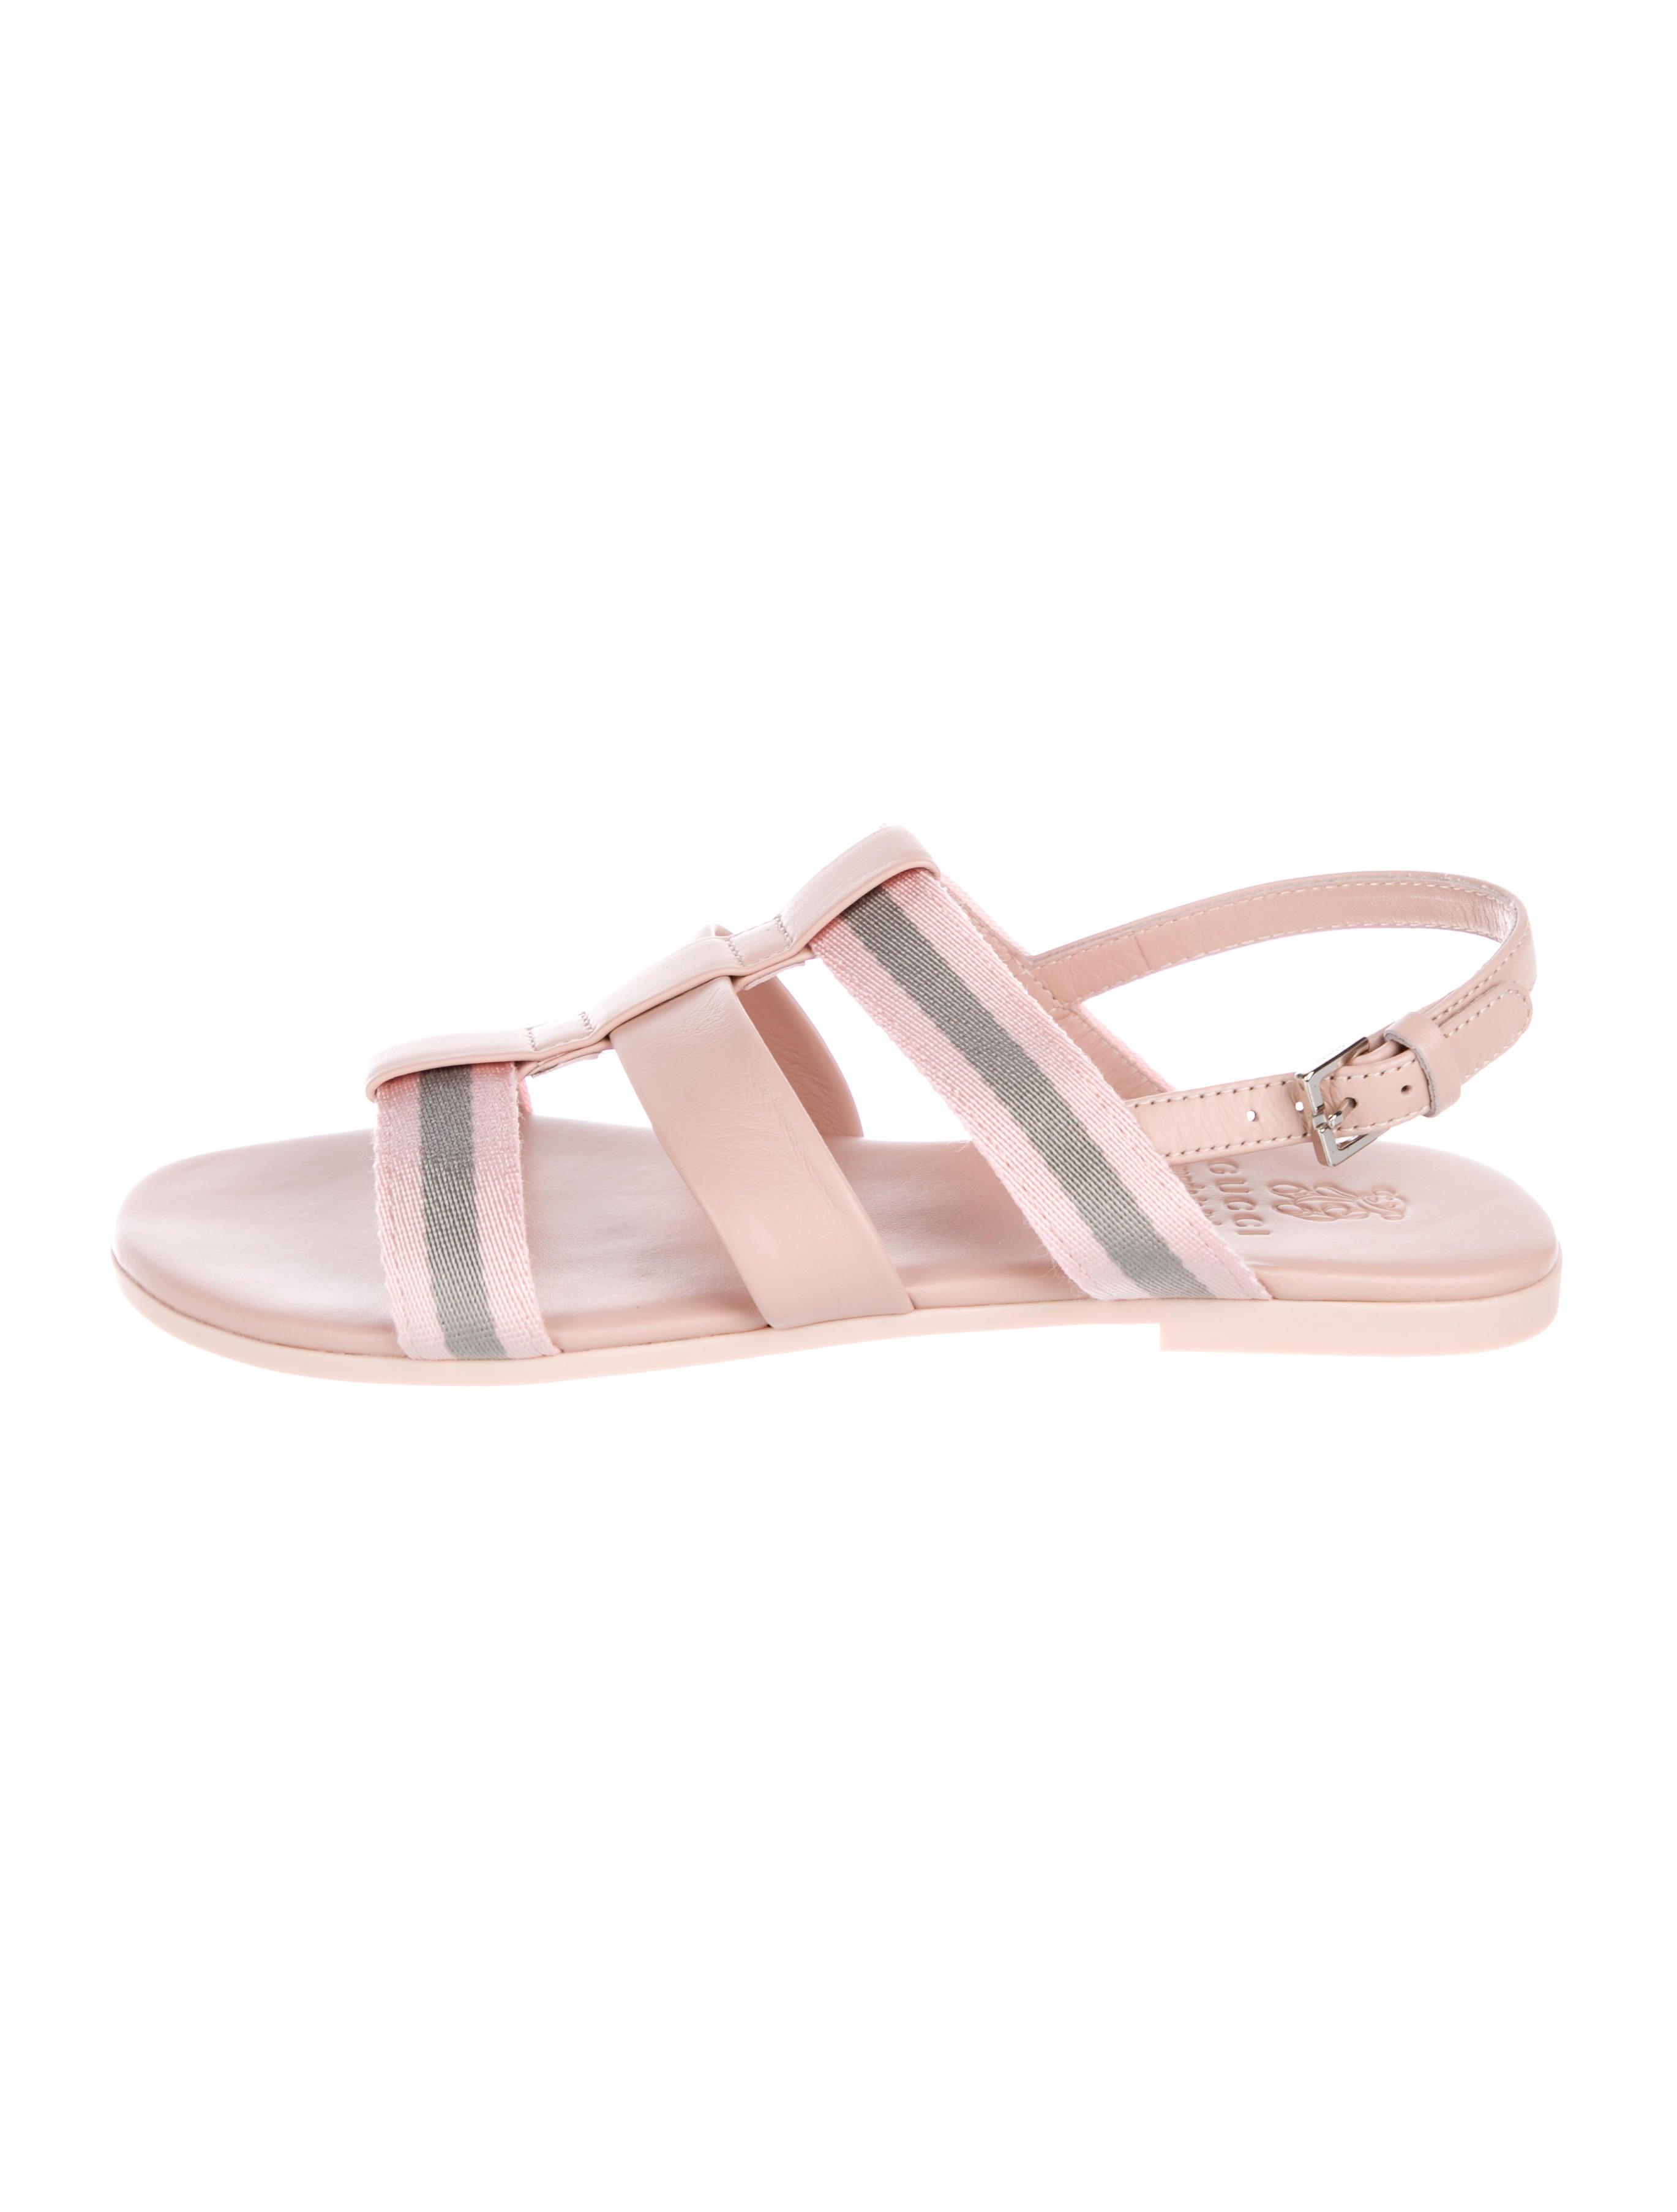 6a7add9791c6 Gucci Girls  Leather Slingback Sandals w  Tags - Girls - GUC229191 ...